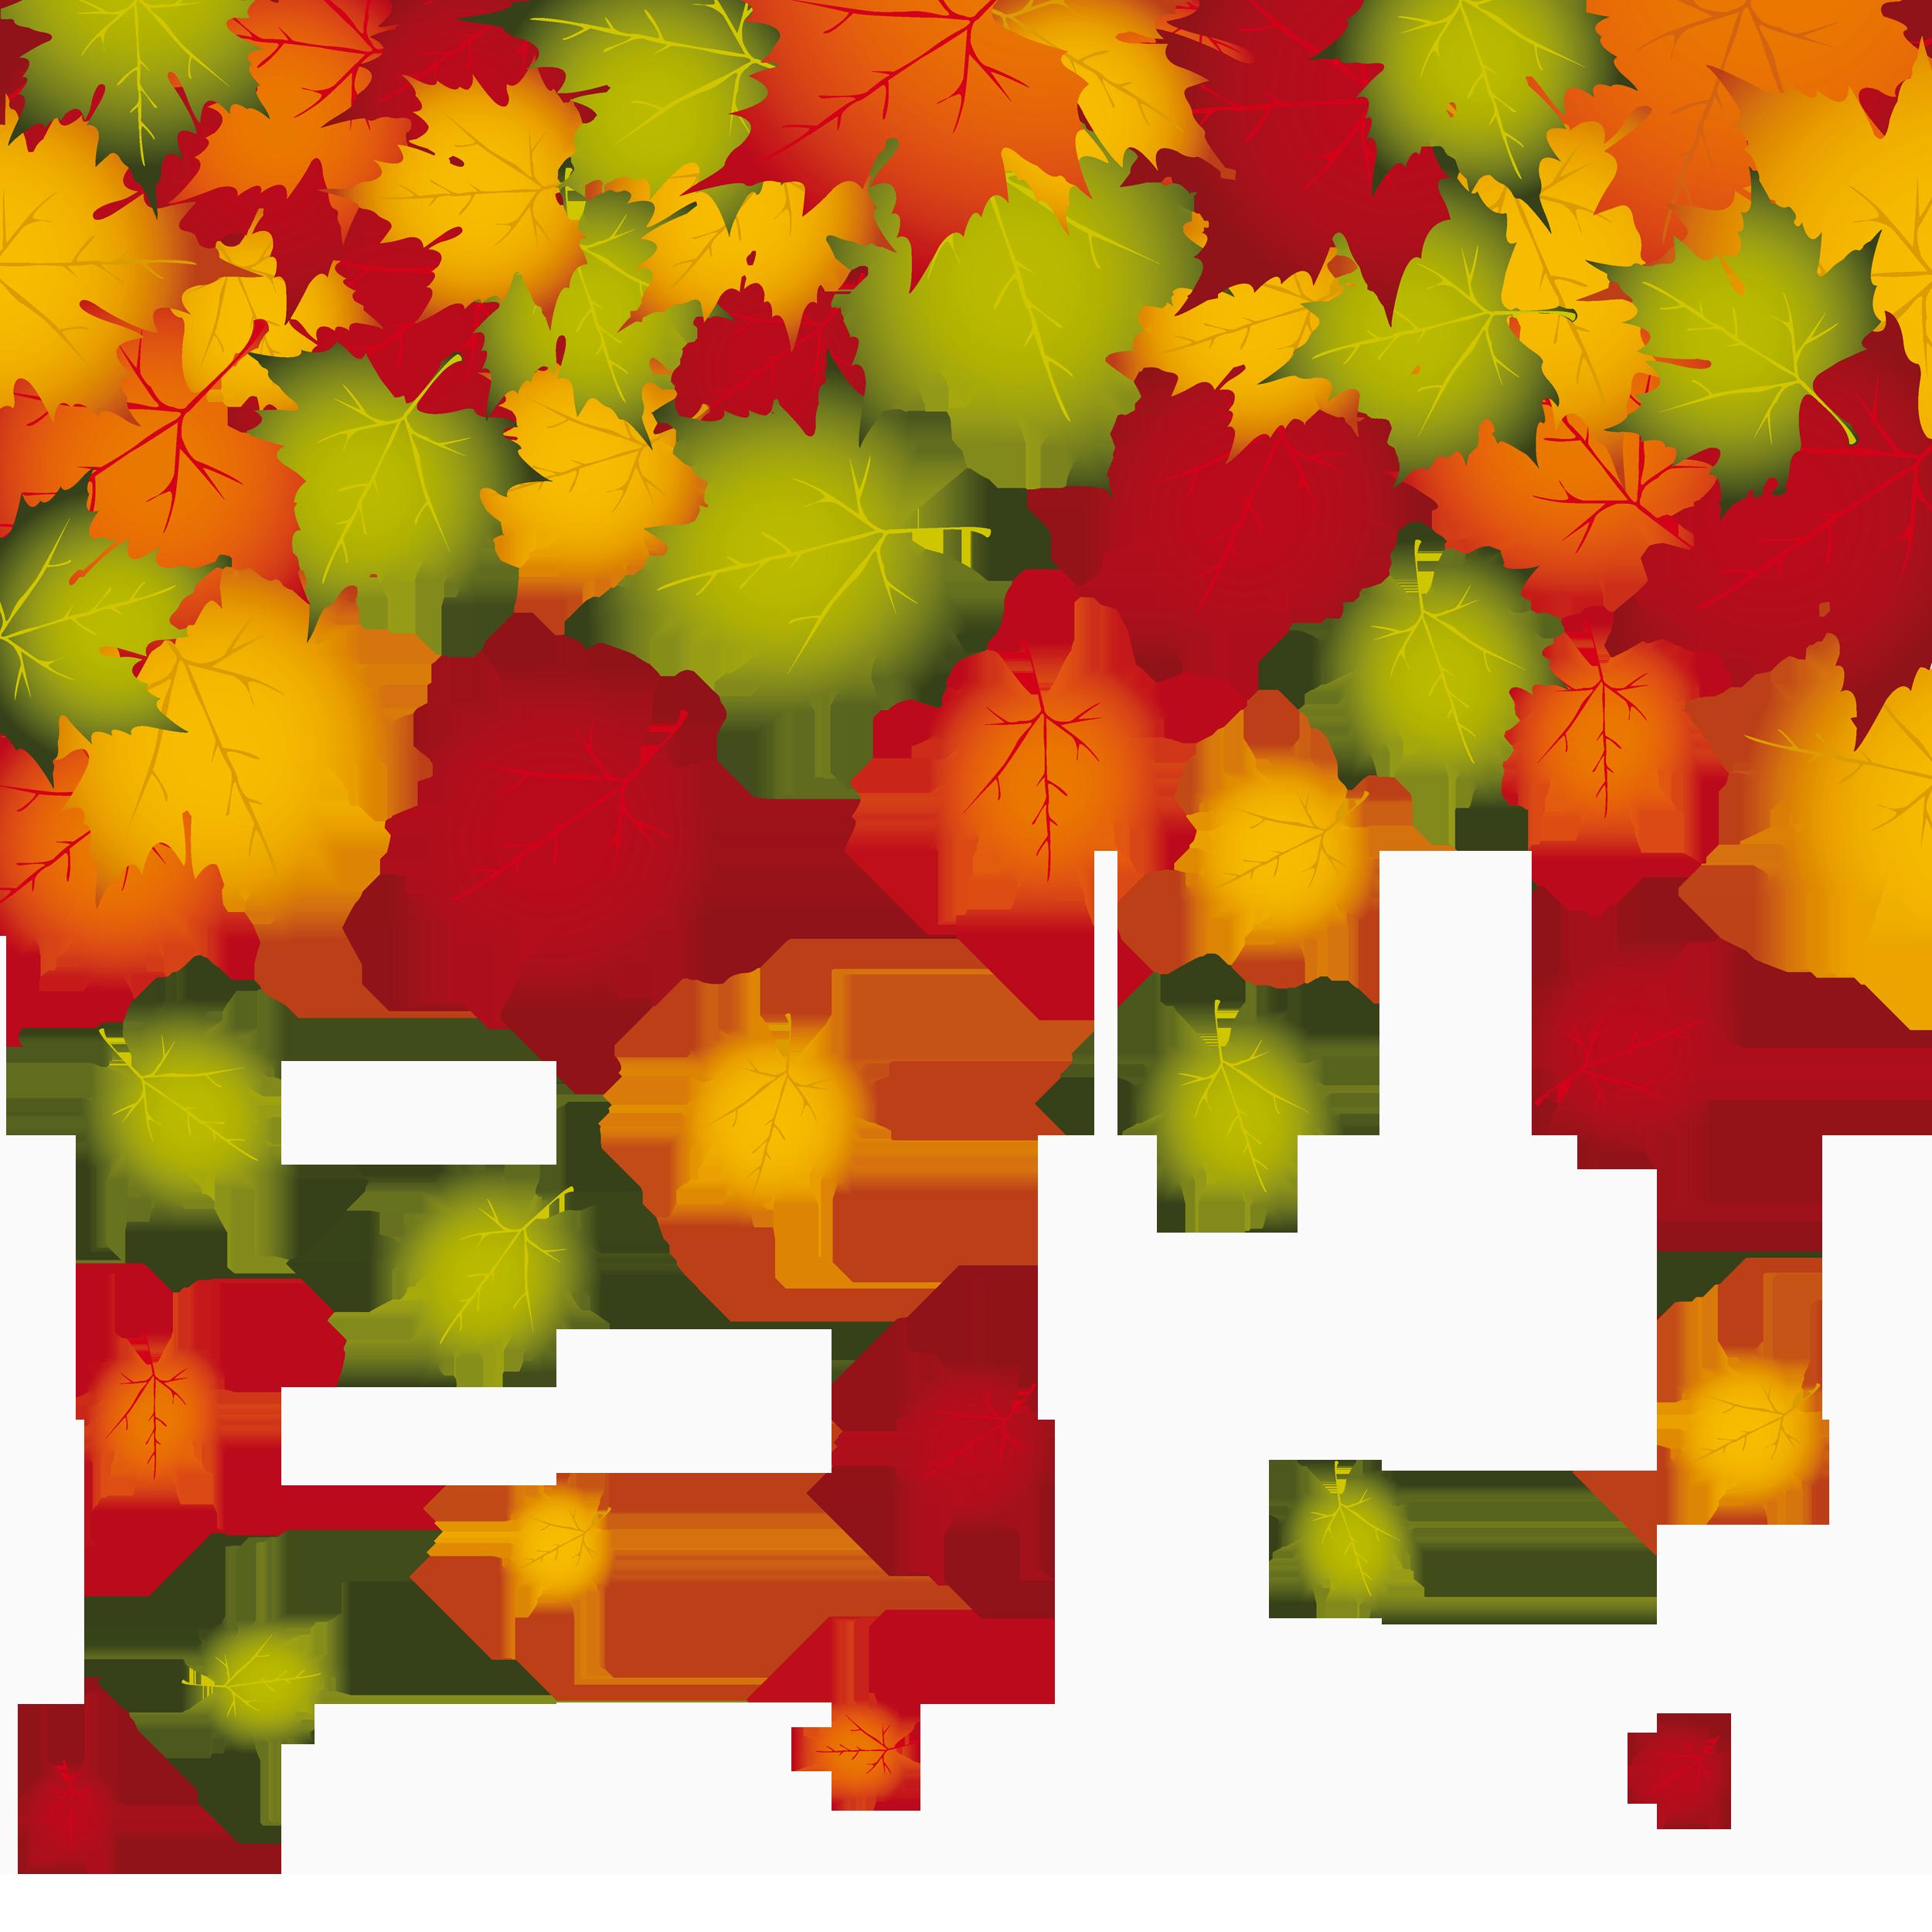 Transparent leaves decoration png. Clipart fall fallen leave